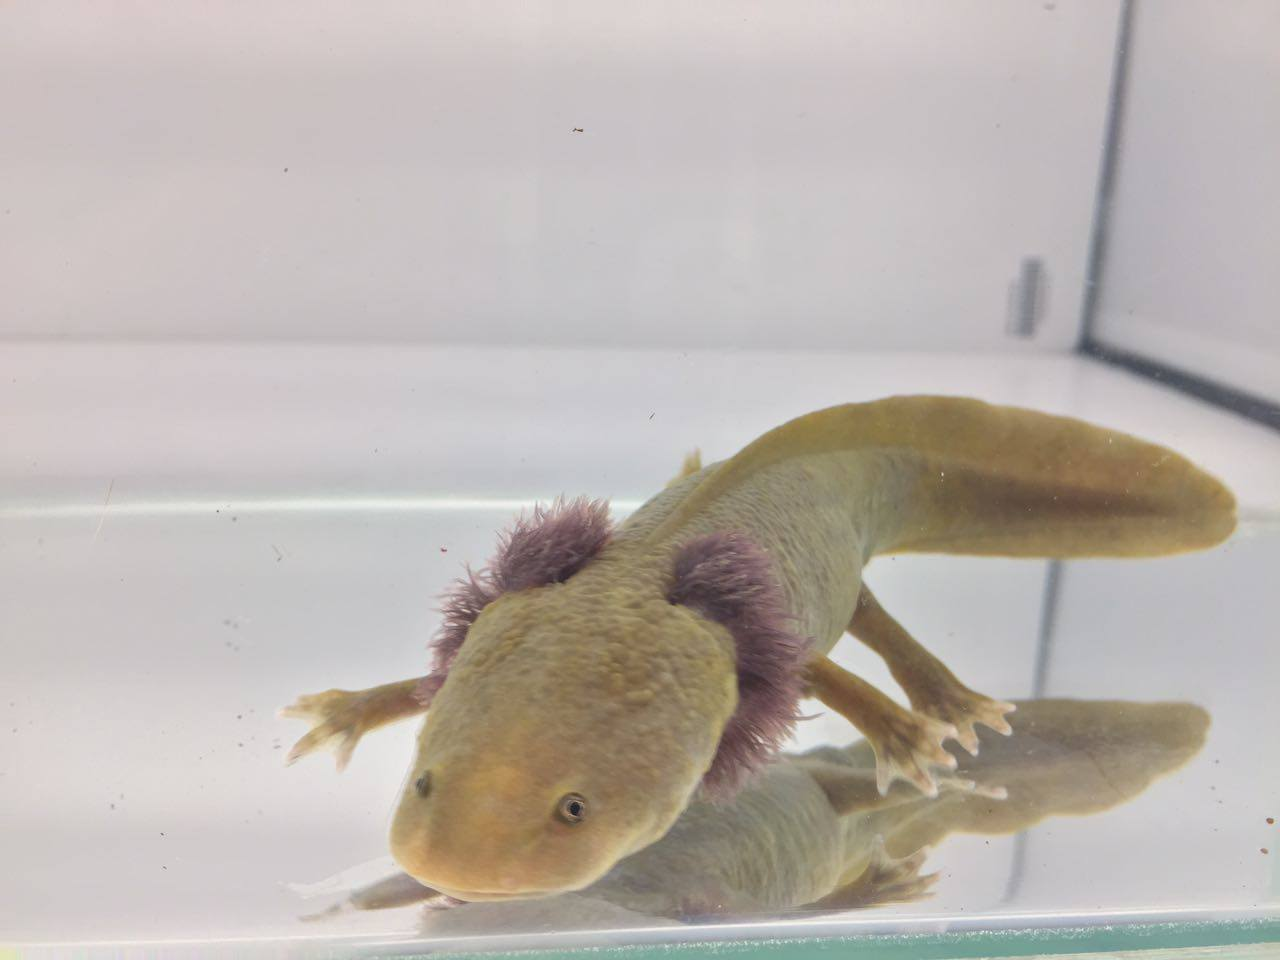 The Lake Patzcuaro salamander, Ambystoma dumerellii, in larval form.  Courtesy of Ambystolab. Photo by Karen Janet Ramos Vazquez, DVM.